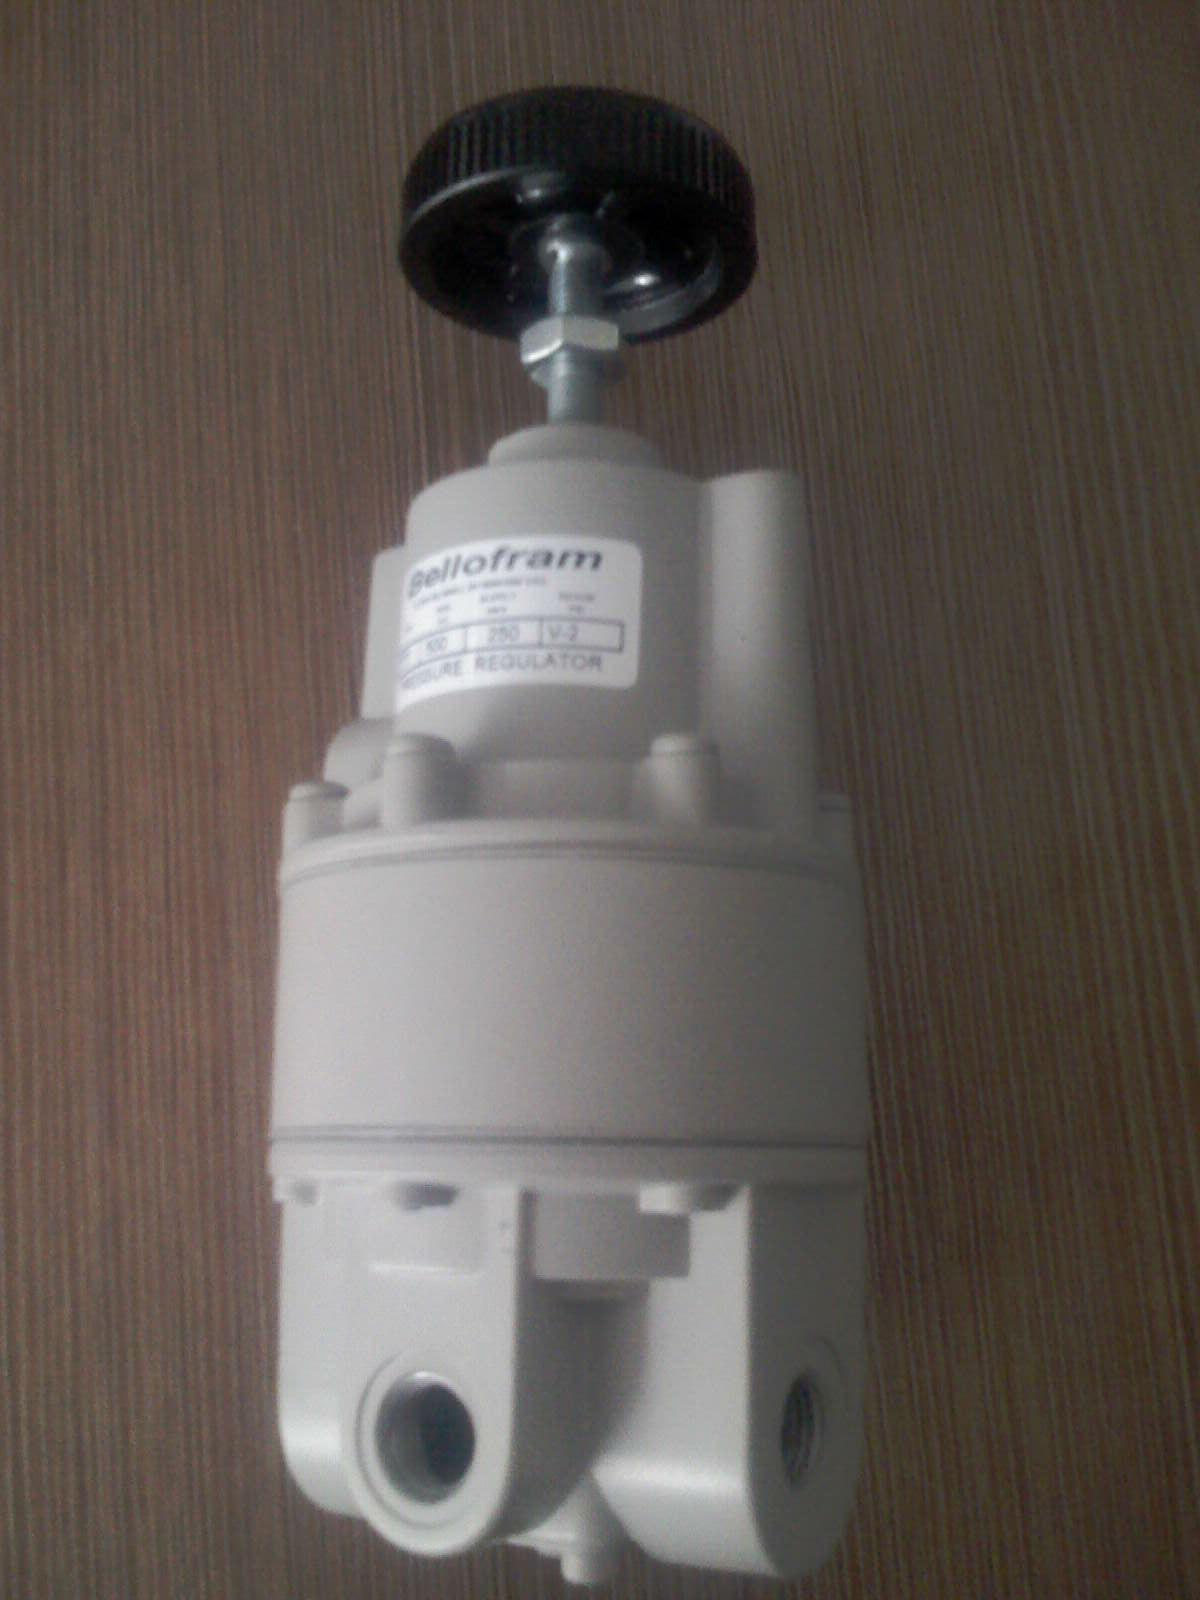 BELLOFRAM T77 vacuum regulator 960-500-000 2PSI vacuum low pressure valve генферон 500 000 ме n10 супп